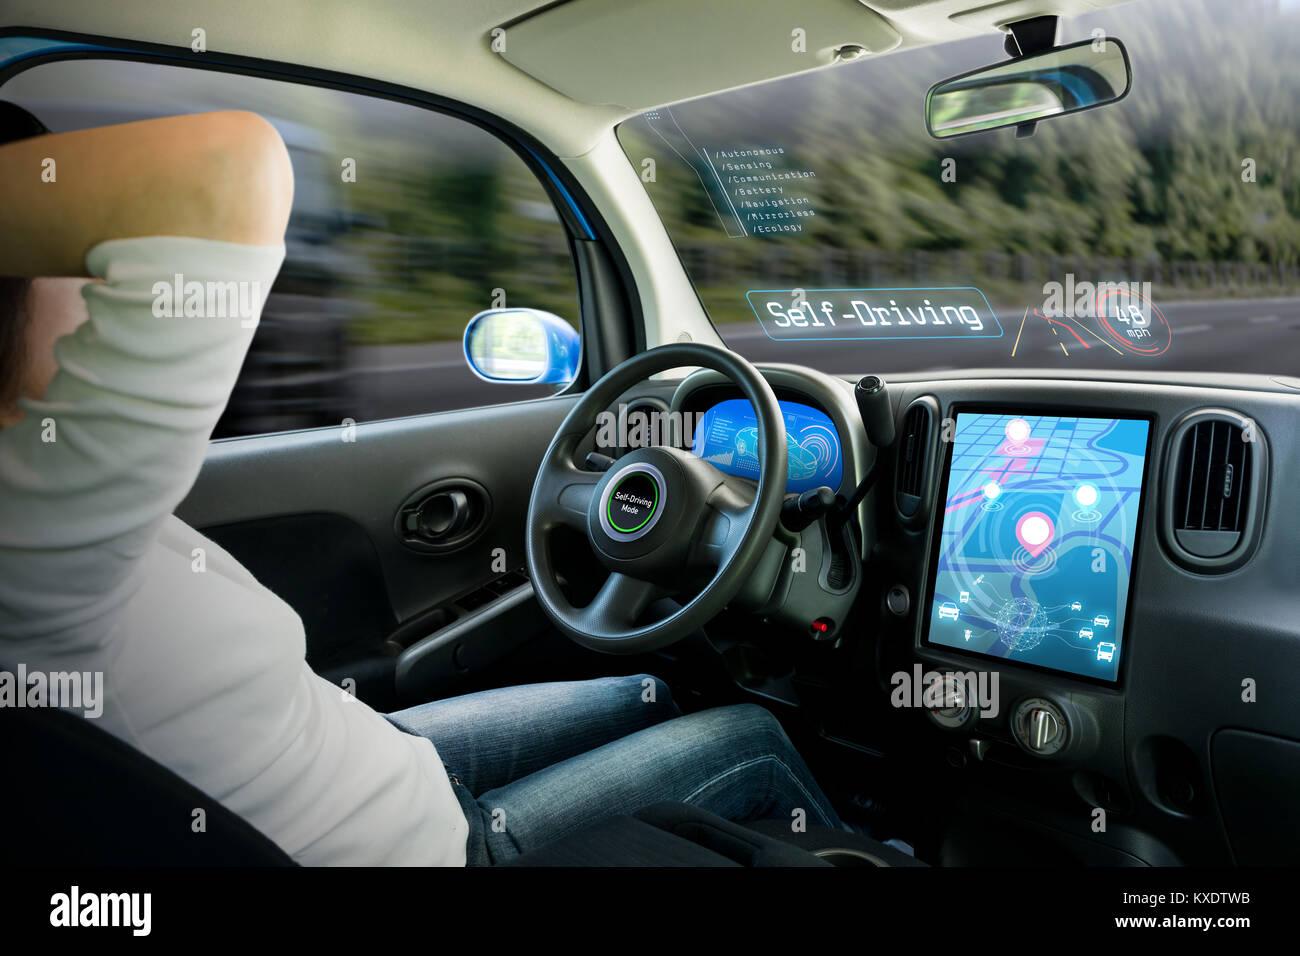 vehicle cockpit and screen, car electronics, automotive technology, autonomous car, abstract image visual - Stock Image